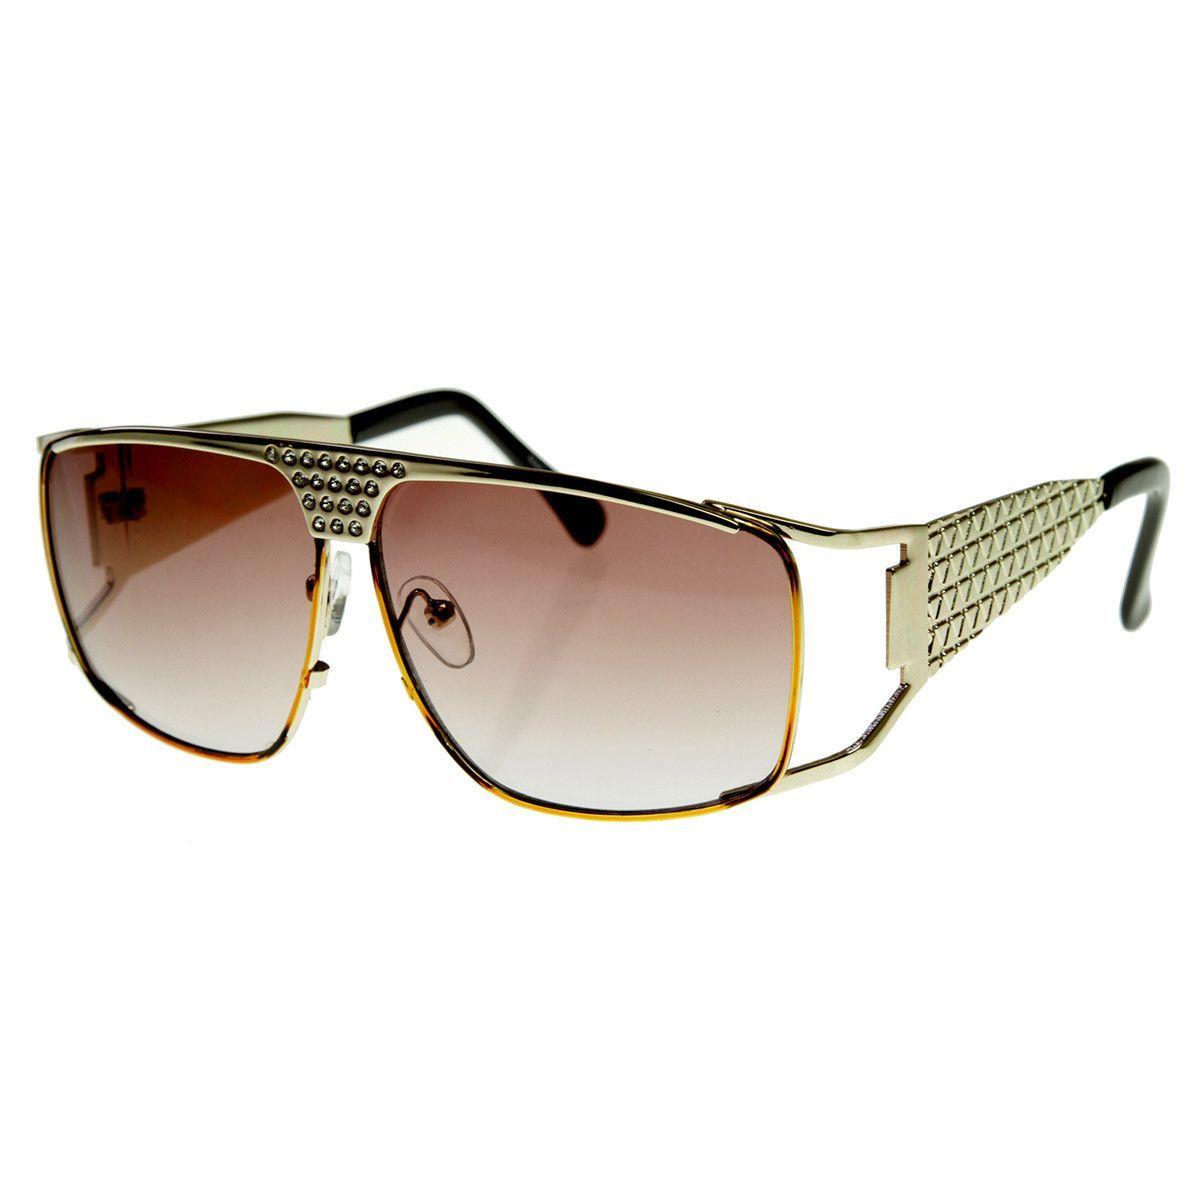 e27efcf30e Large Metal Elvis Style Glasses Sunglasses w  Rhinestones  sunglass  frame   bold  sunglasses  cateye  mirrored  summer  womens  sunglassla  clear